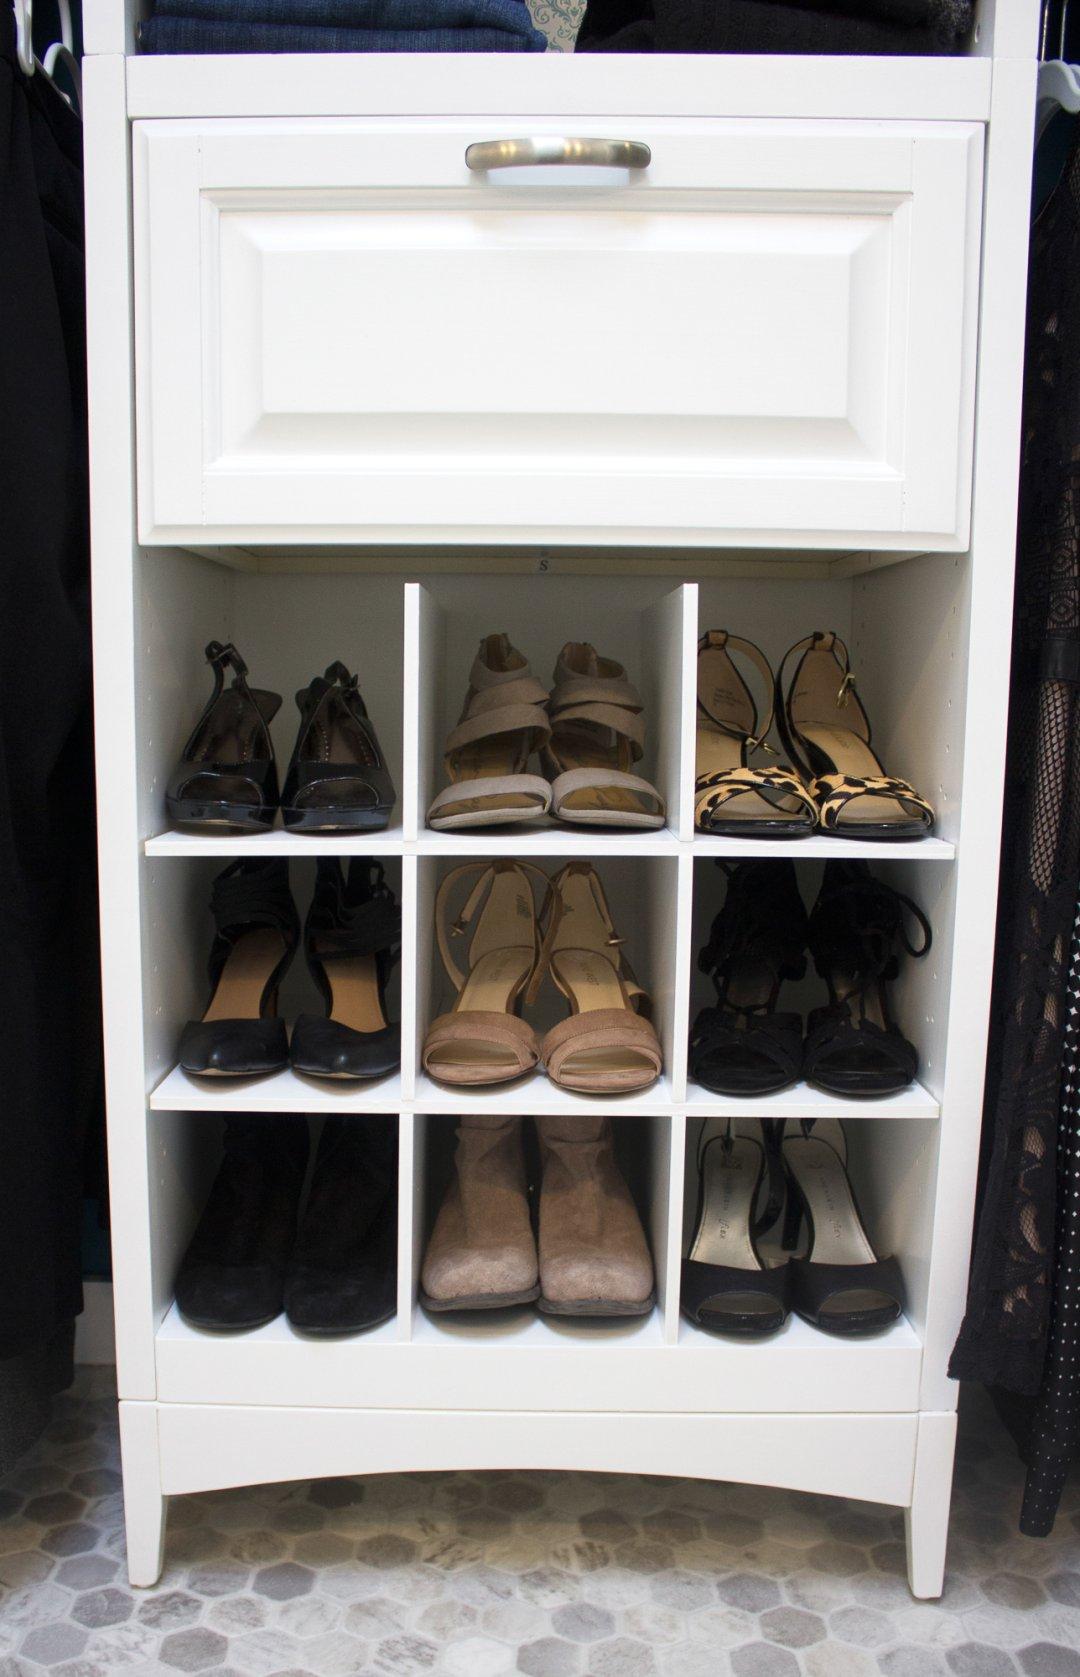 How to Improve Storage with an Elegant Closet Organizer